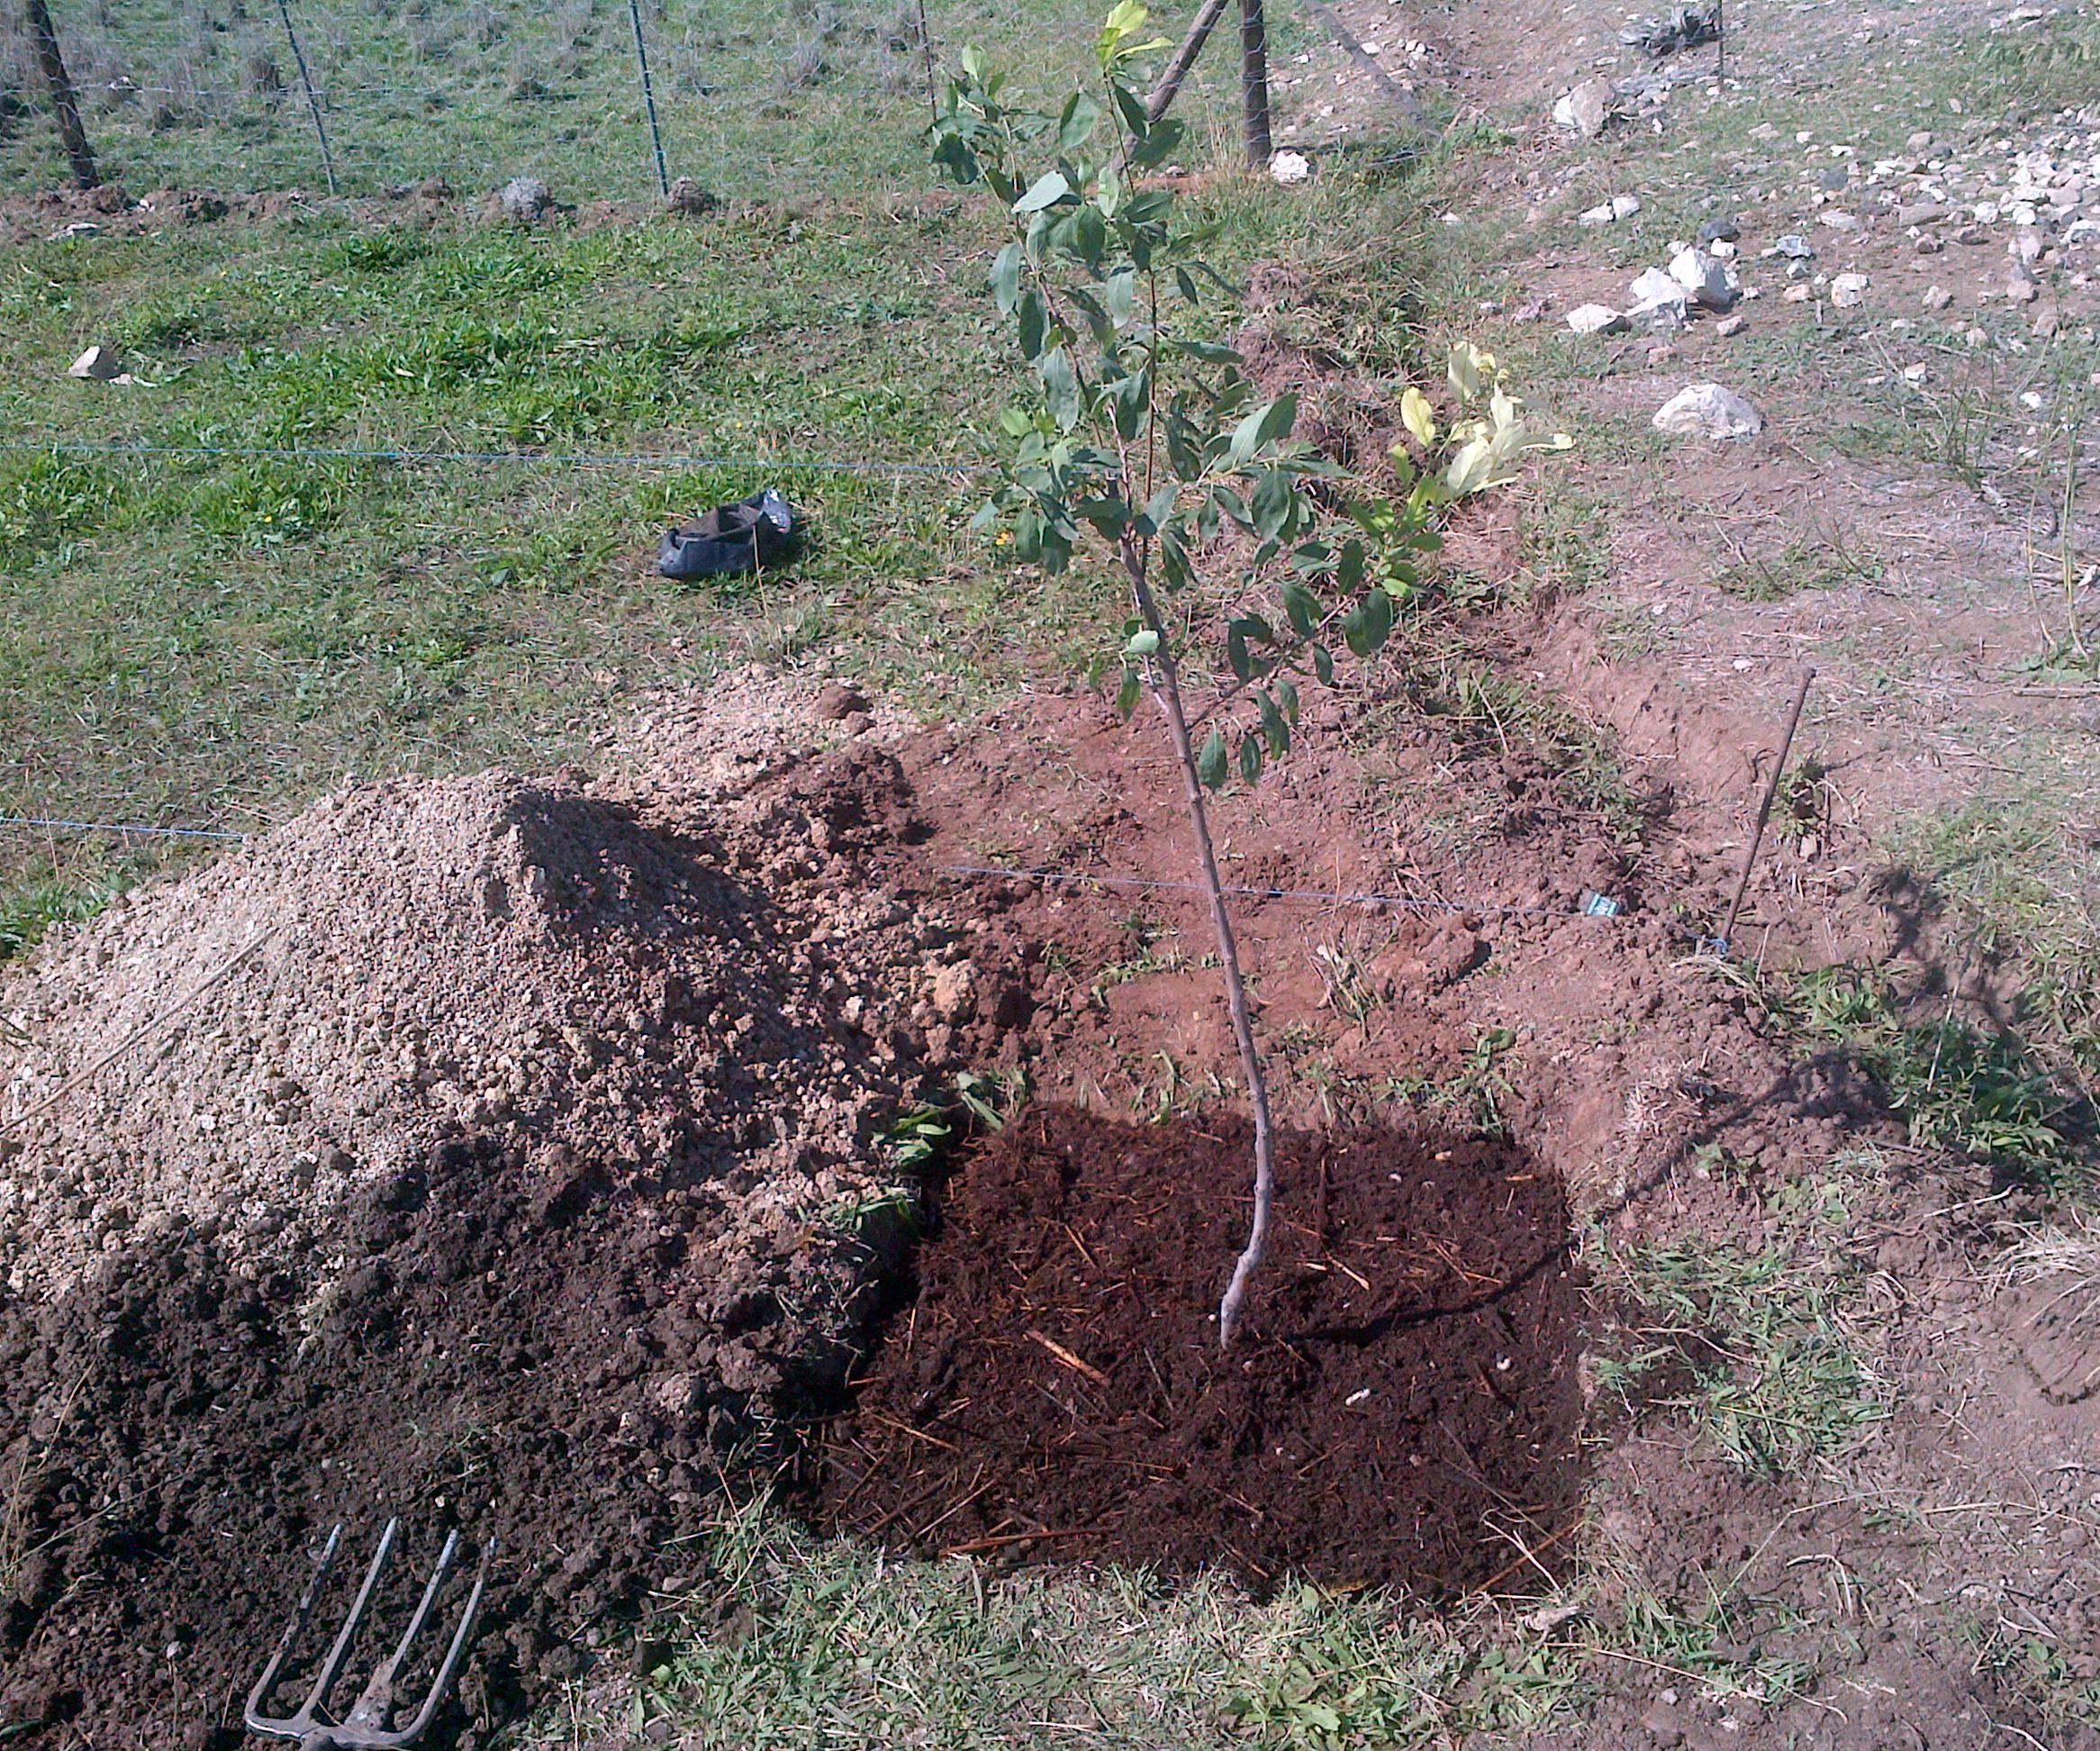 Planting tree Ellen White way (EGW)